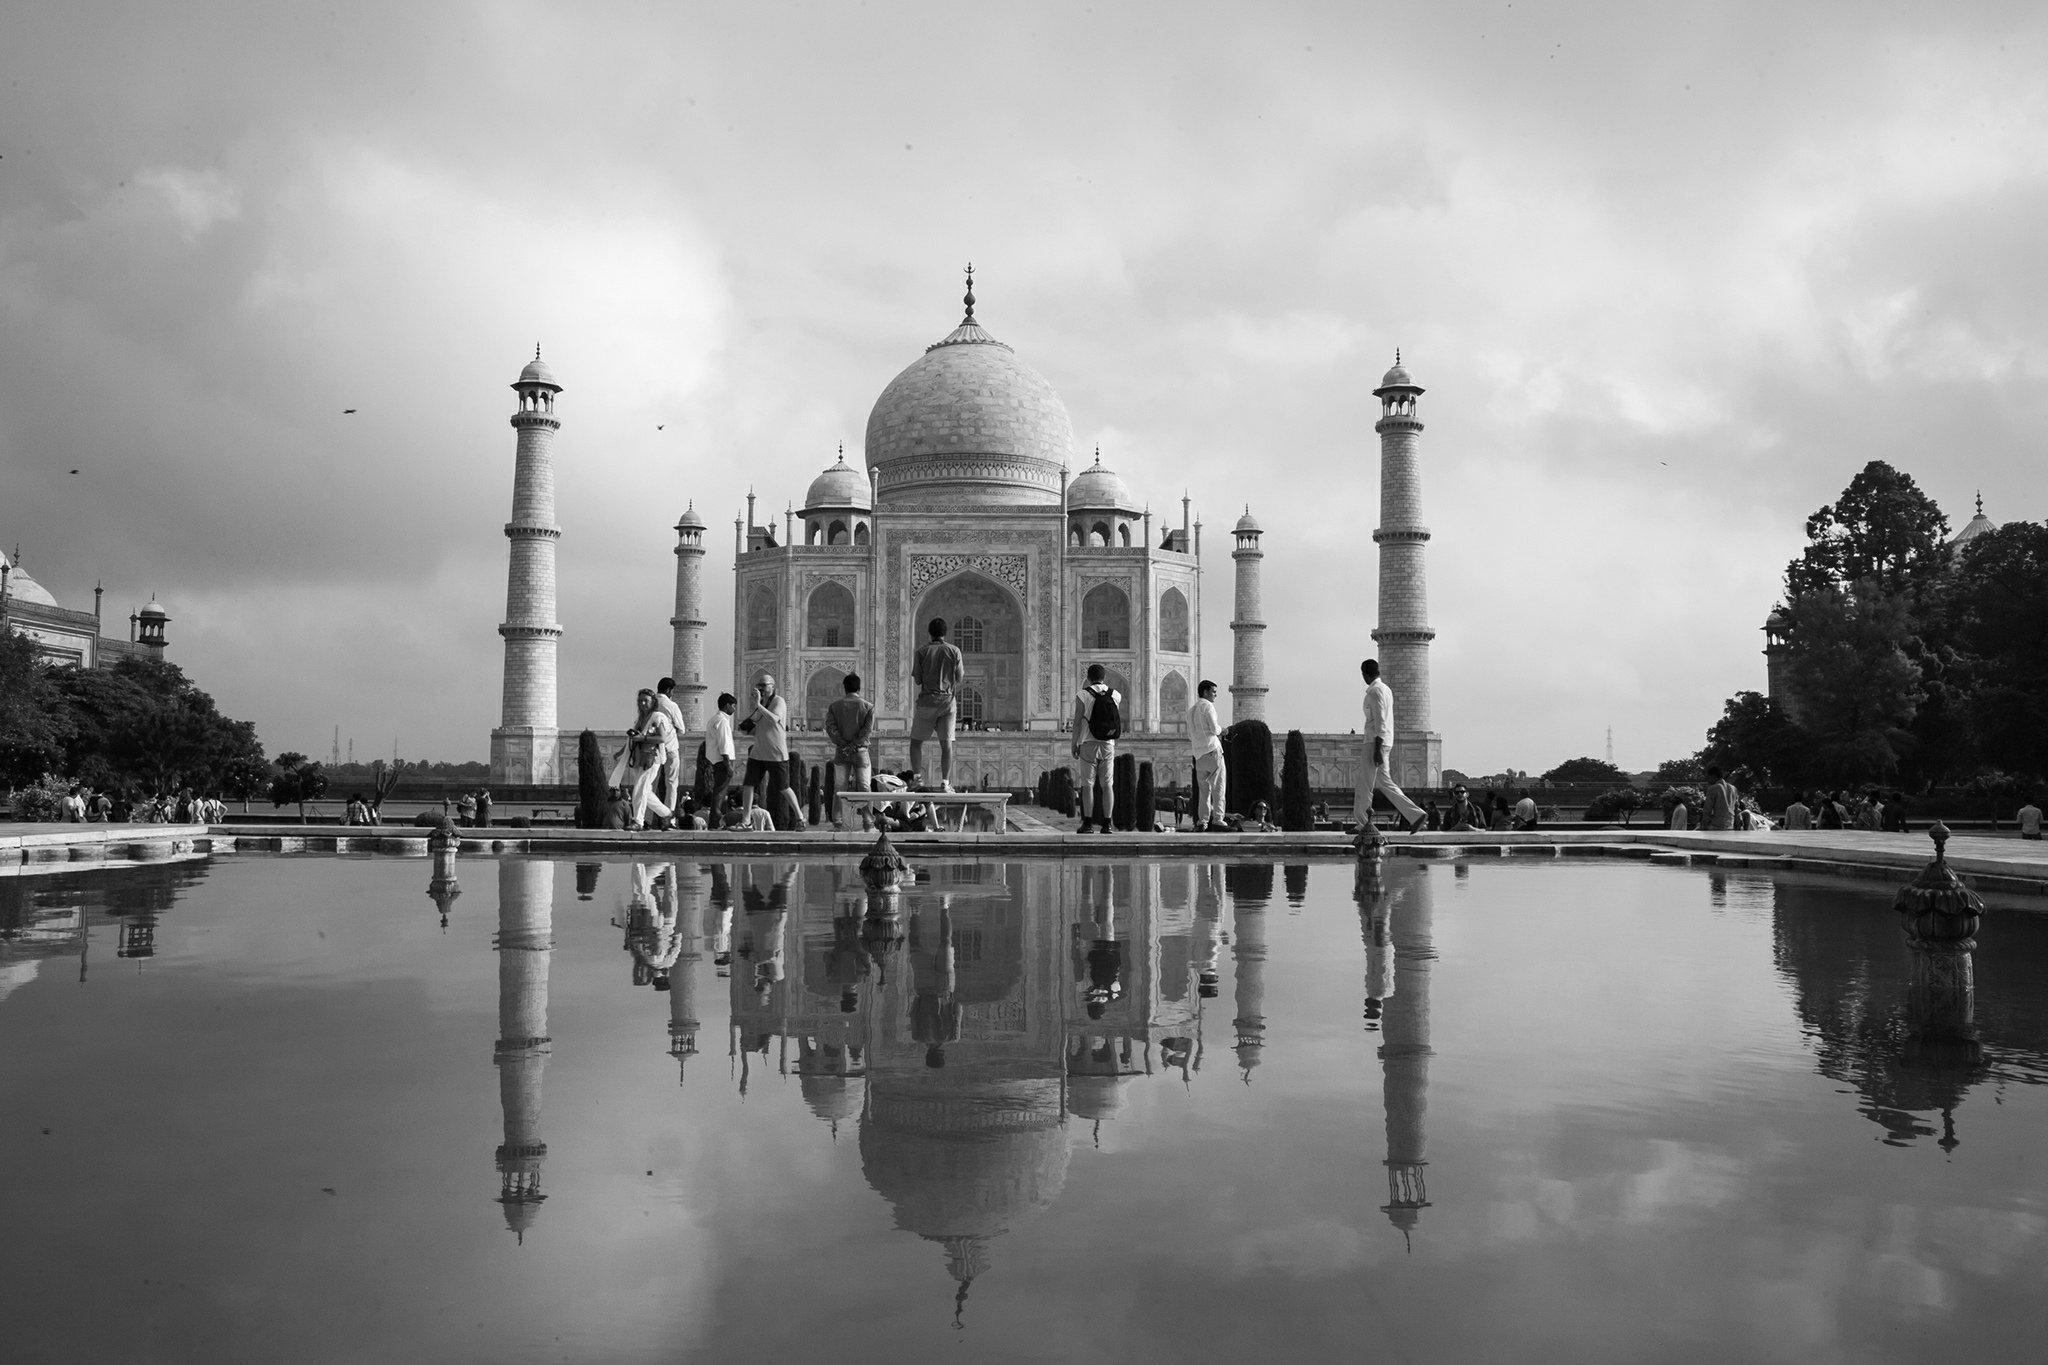 Visit Taj Mahal by Super Fast Train | Pioneer Holidays